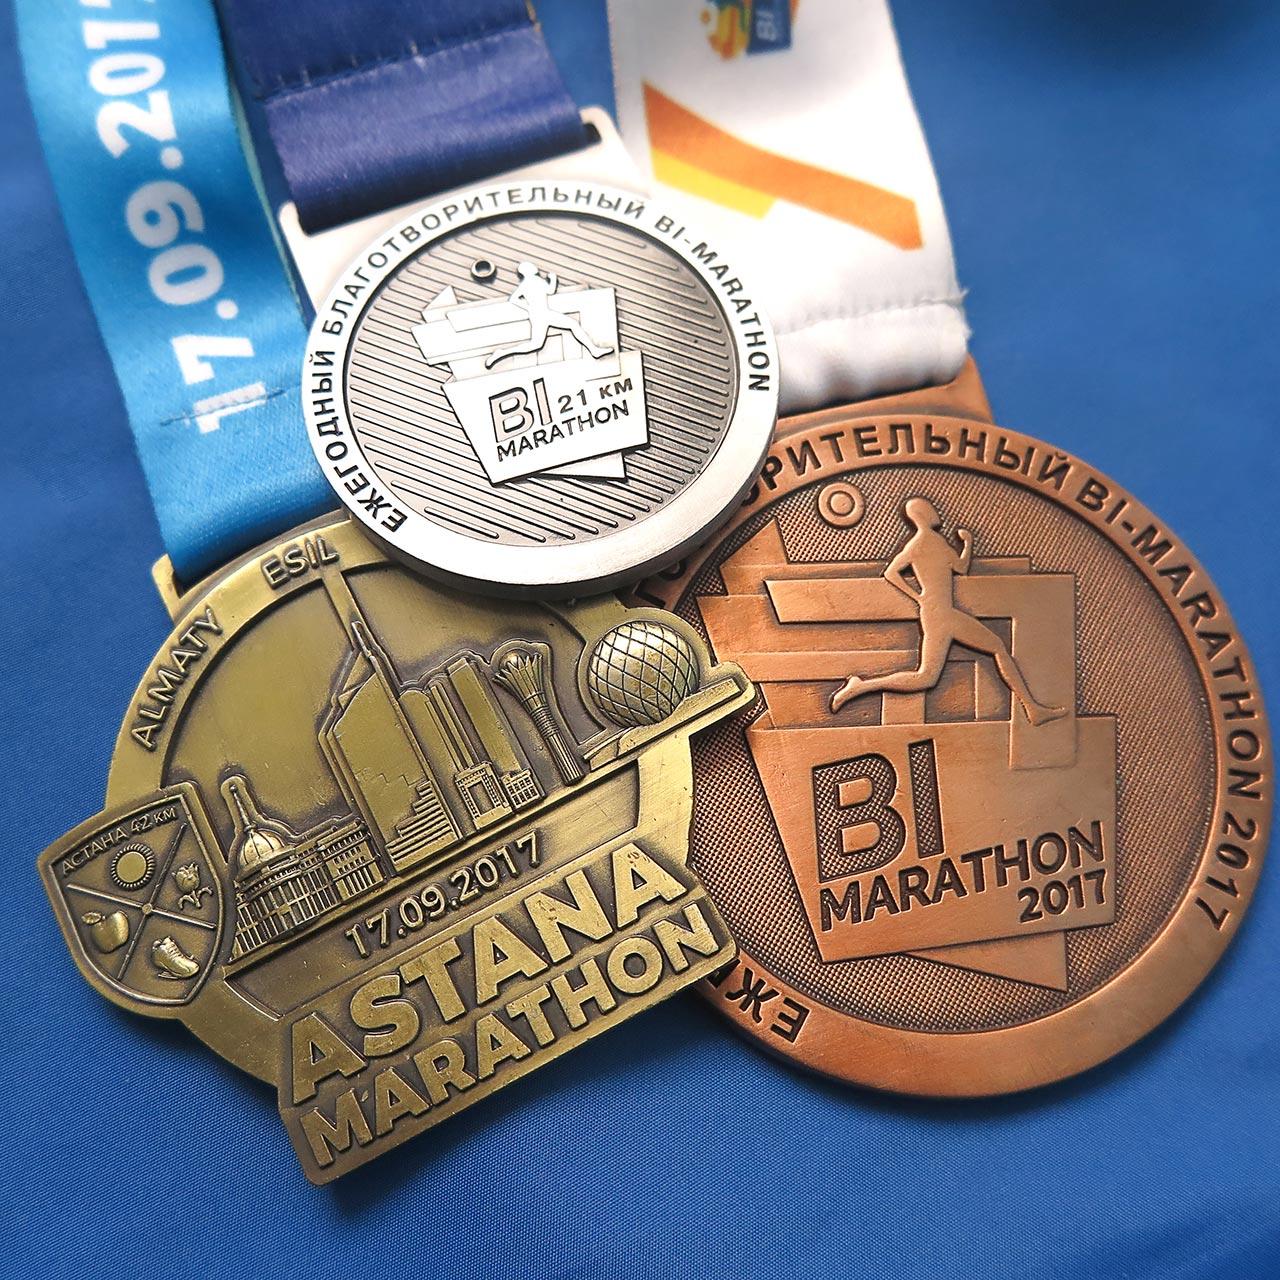 Appazov Branding Agency третий год партнеры BI Marathon